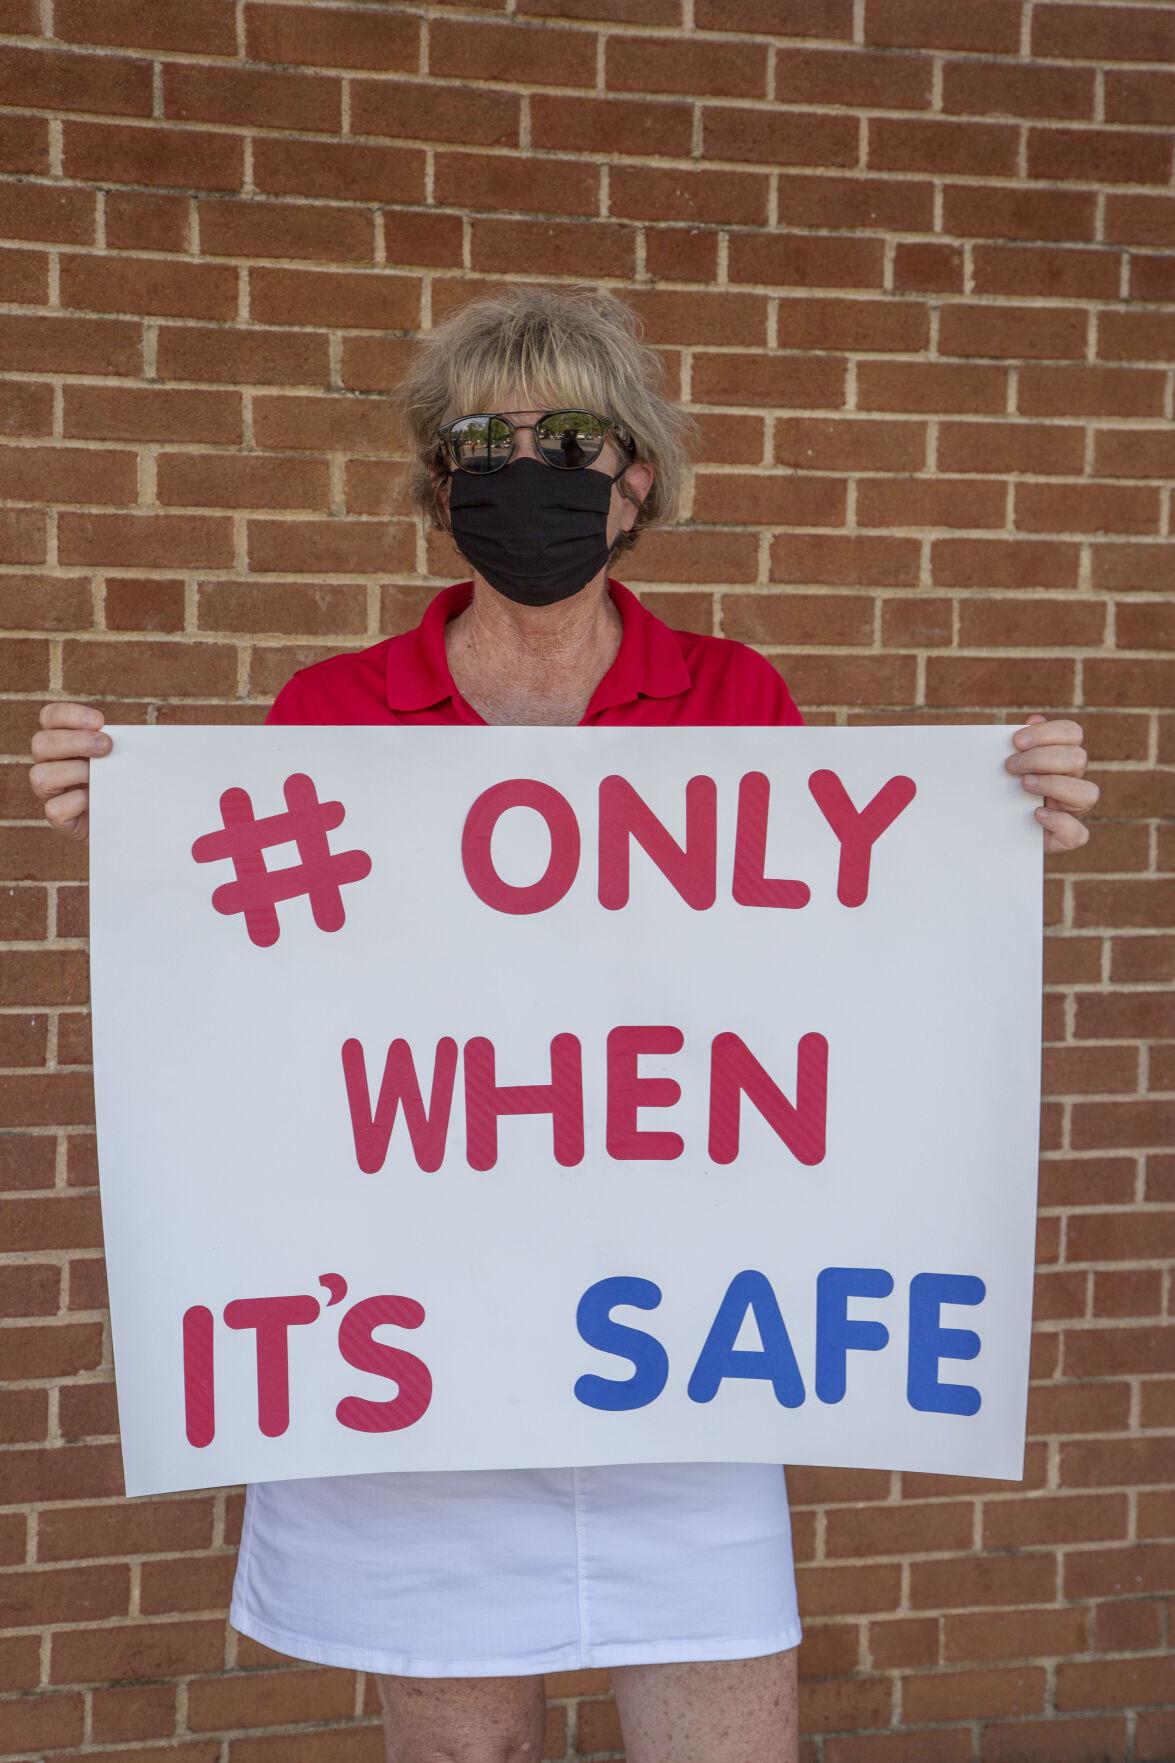 photo_ft_news_school board 1_072920.jpg